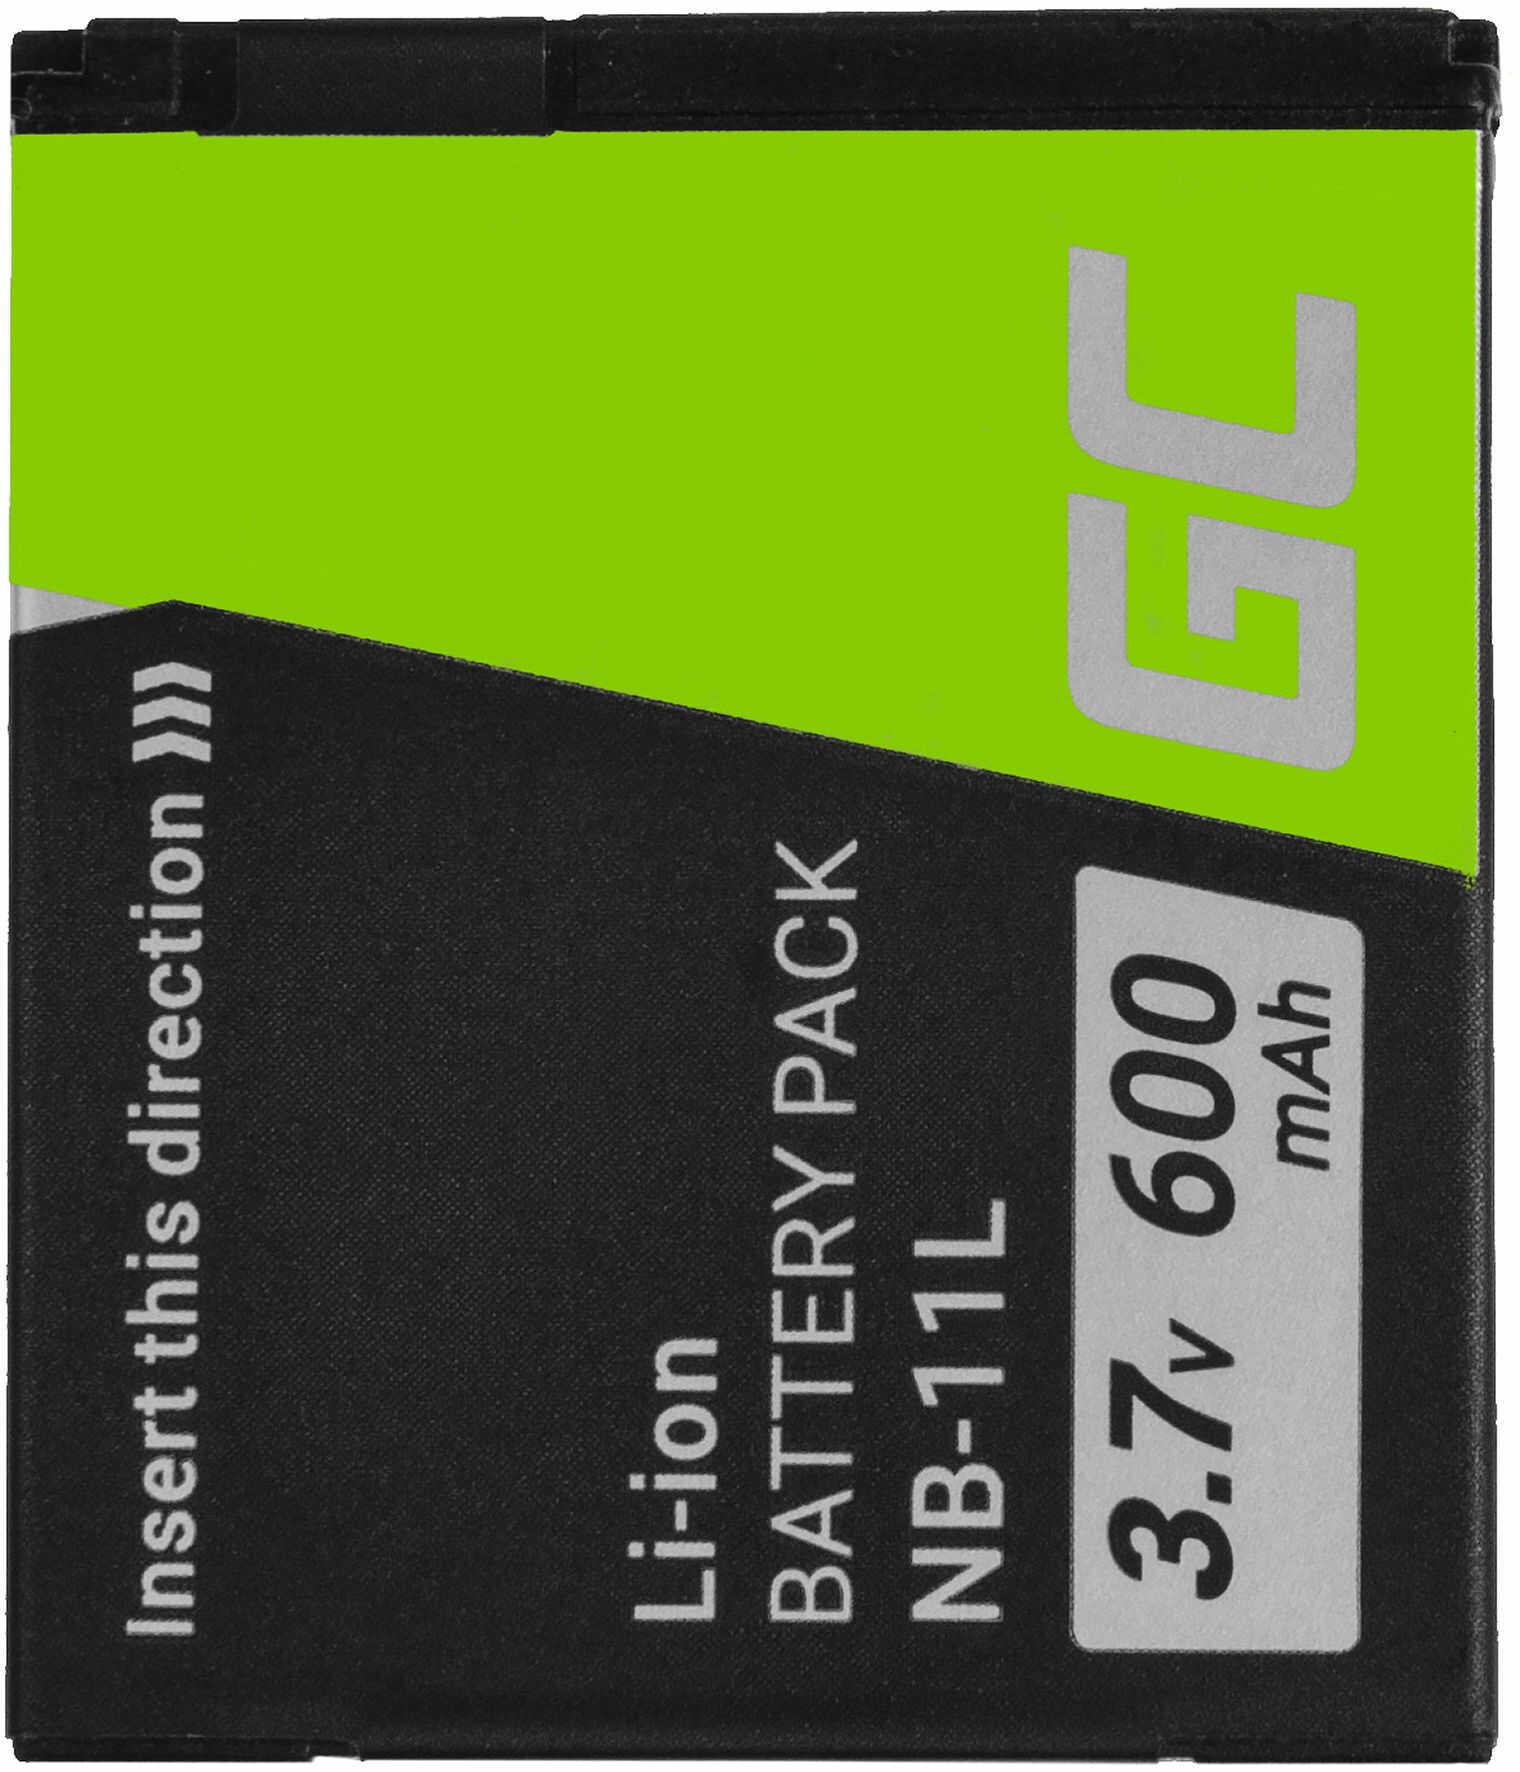 Akumulator Bateria Green Cell  NB-11L do Canon IXUS 125HS 240HS 265HS 275HS 285HS PowerShot ELPH 110HS 320HS 340HS 9 3.7V 600mAh